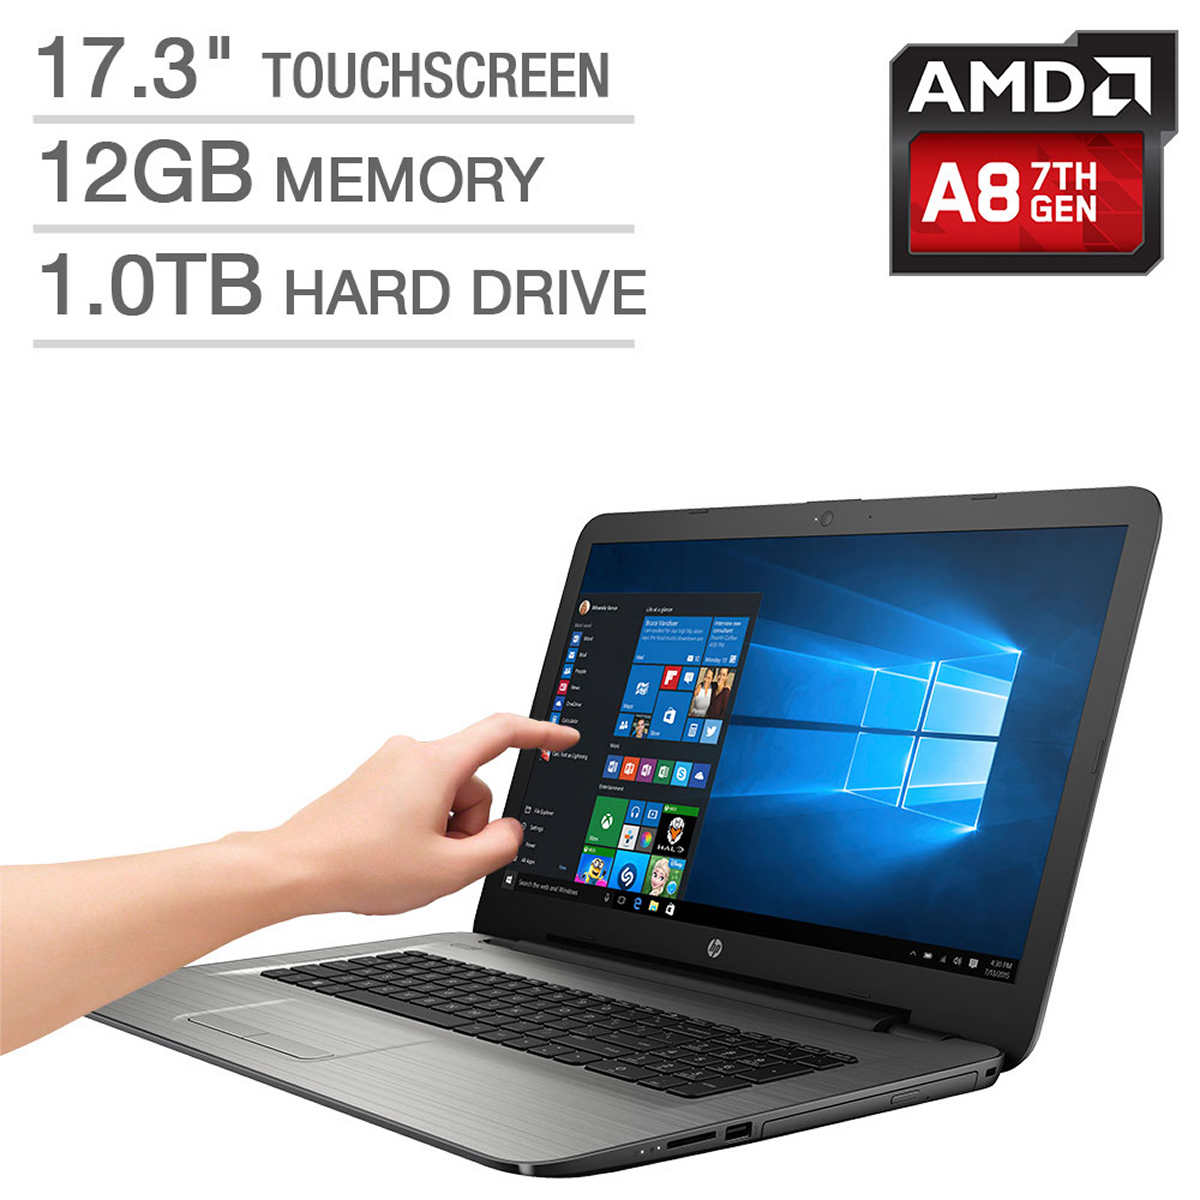 Blue apron costco - Hp 17z Touchscreen Laptop Amd A8 1080p